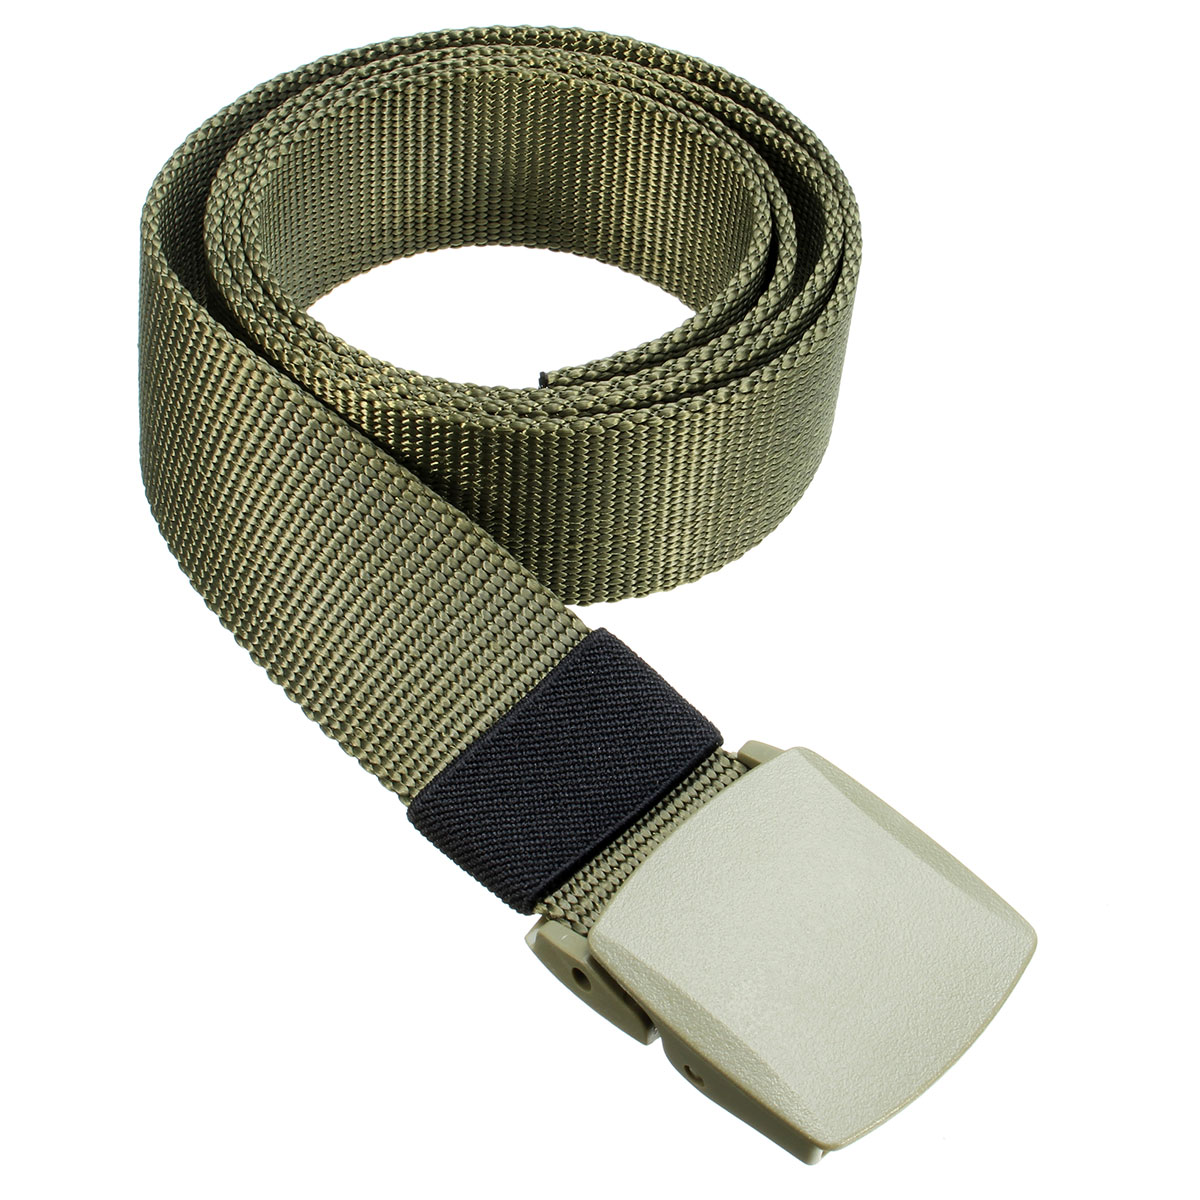 Adjustable Survival Military Tactical Belt Emergency  Rescue Sports Belt